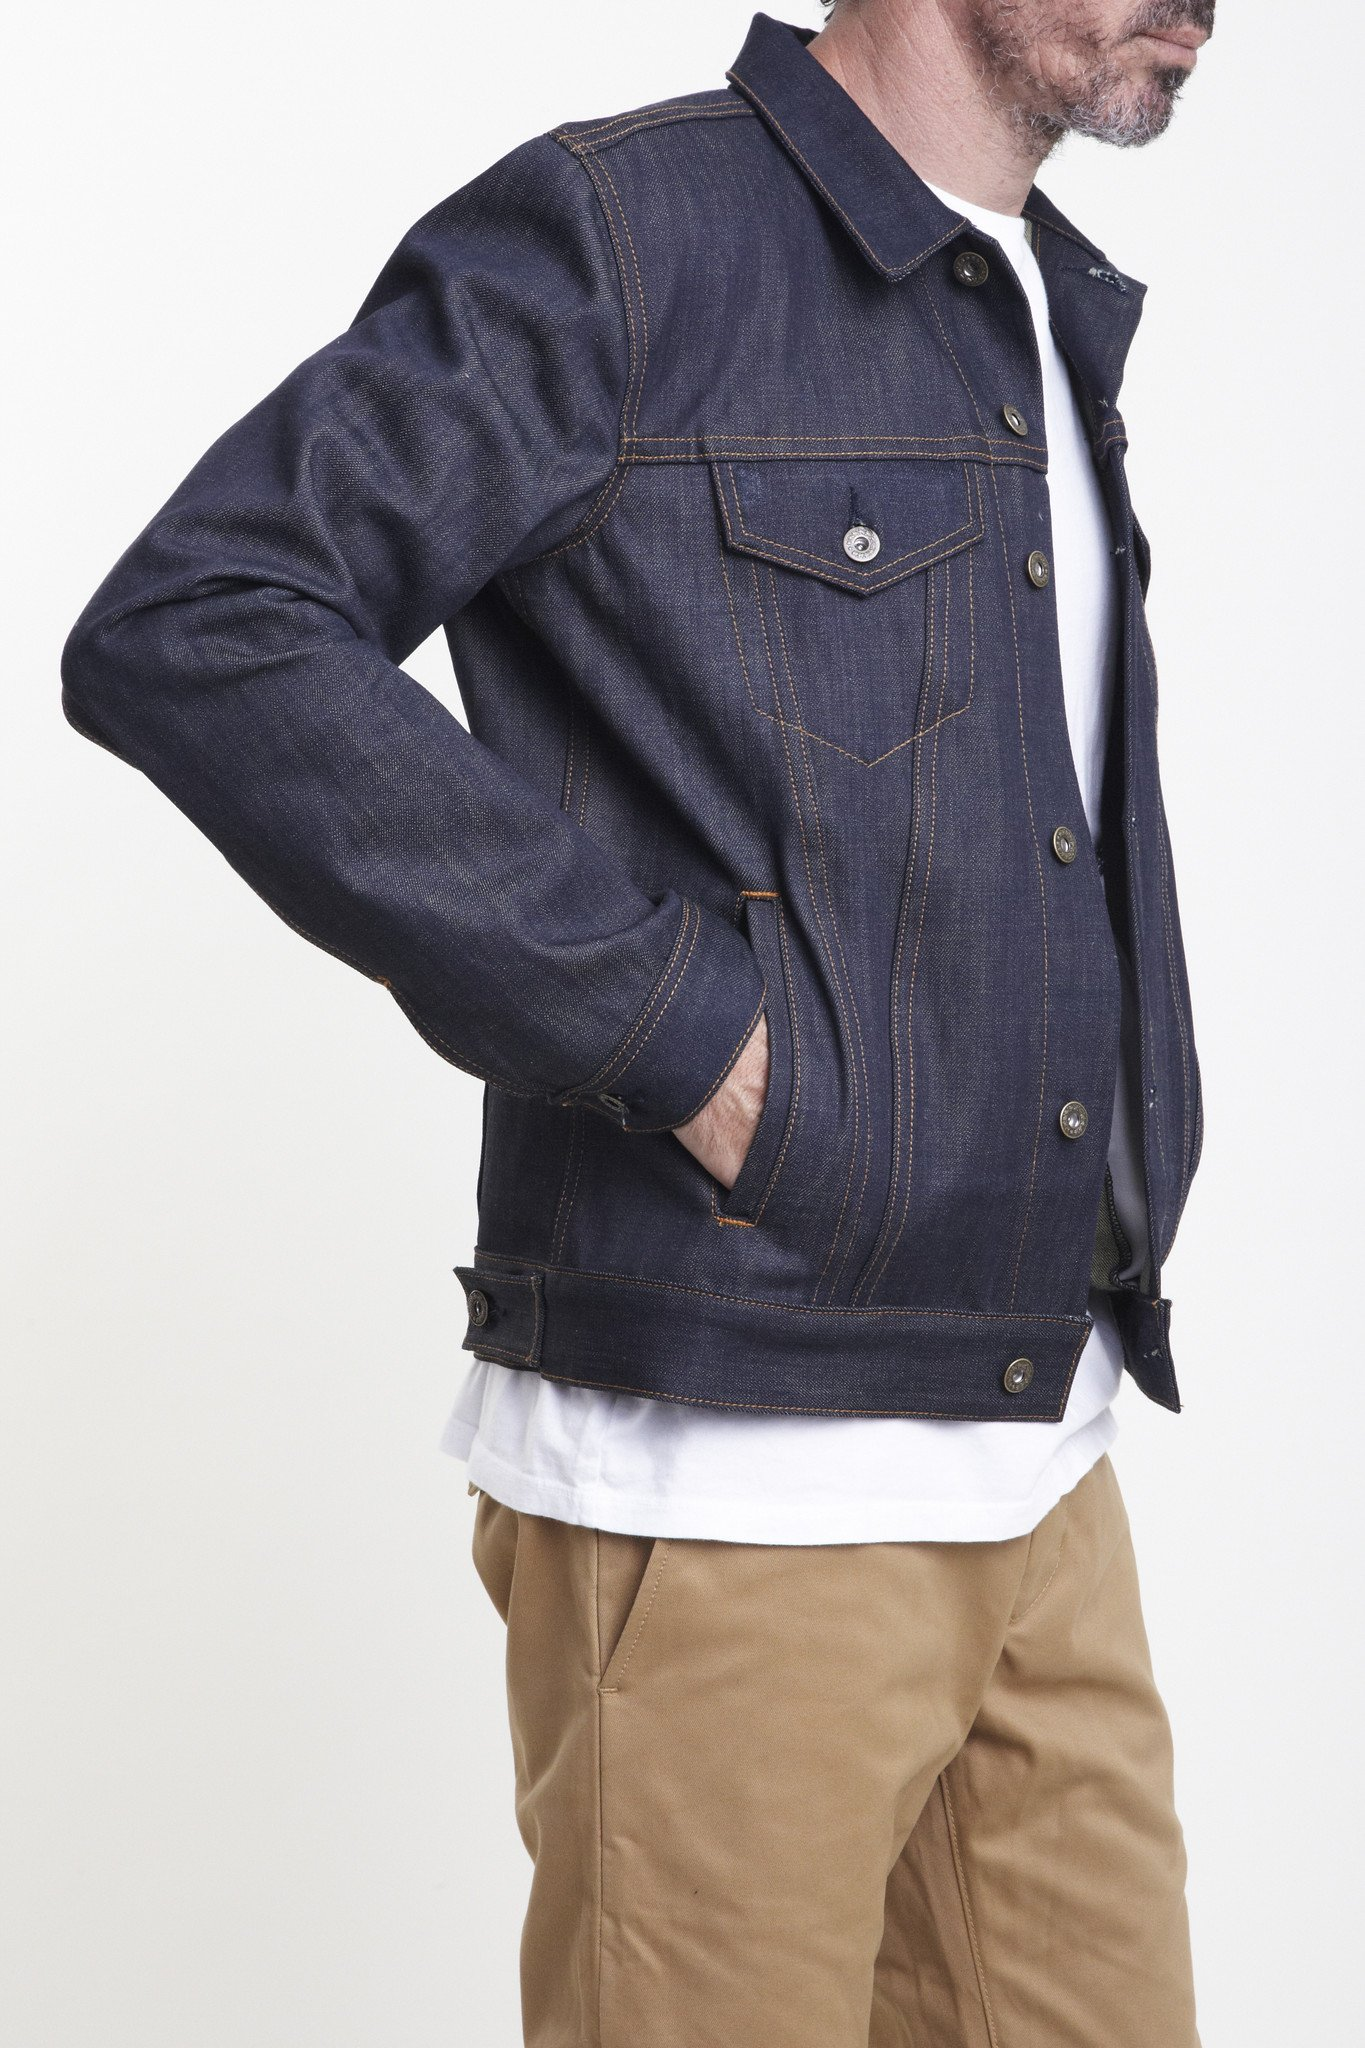 jean jacket the ironside 15oz cone mills selvage denim jacket pduapqh